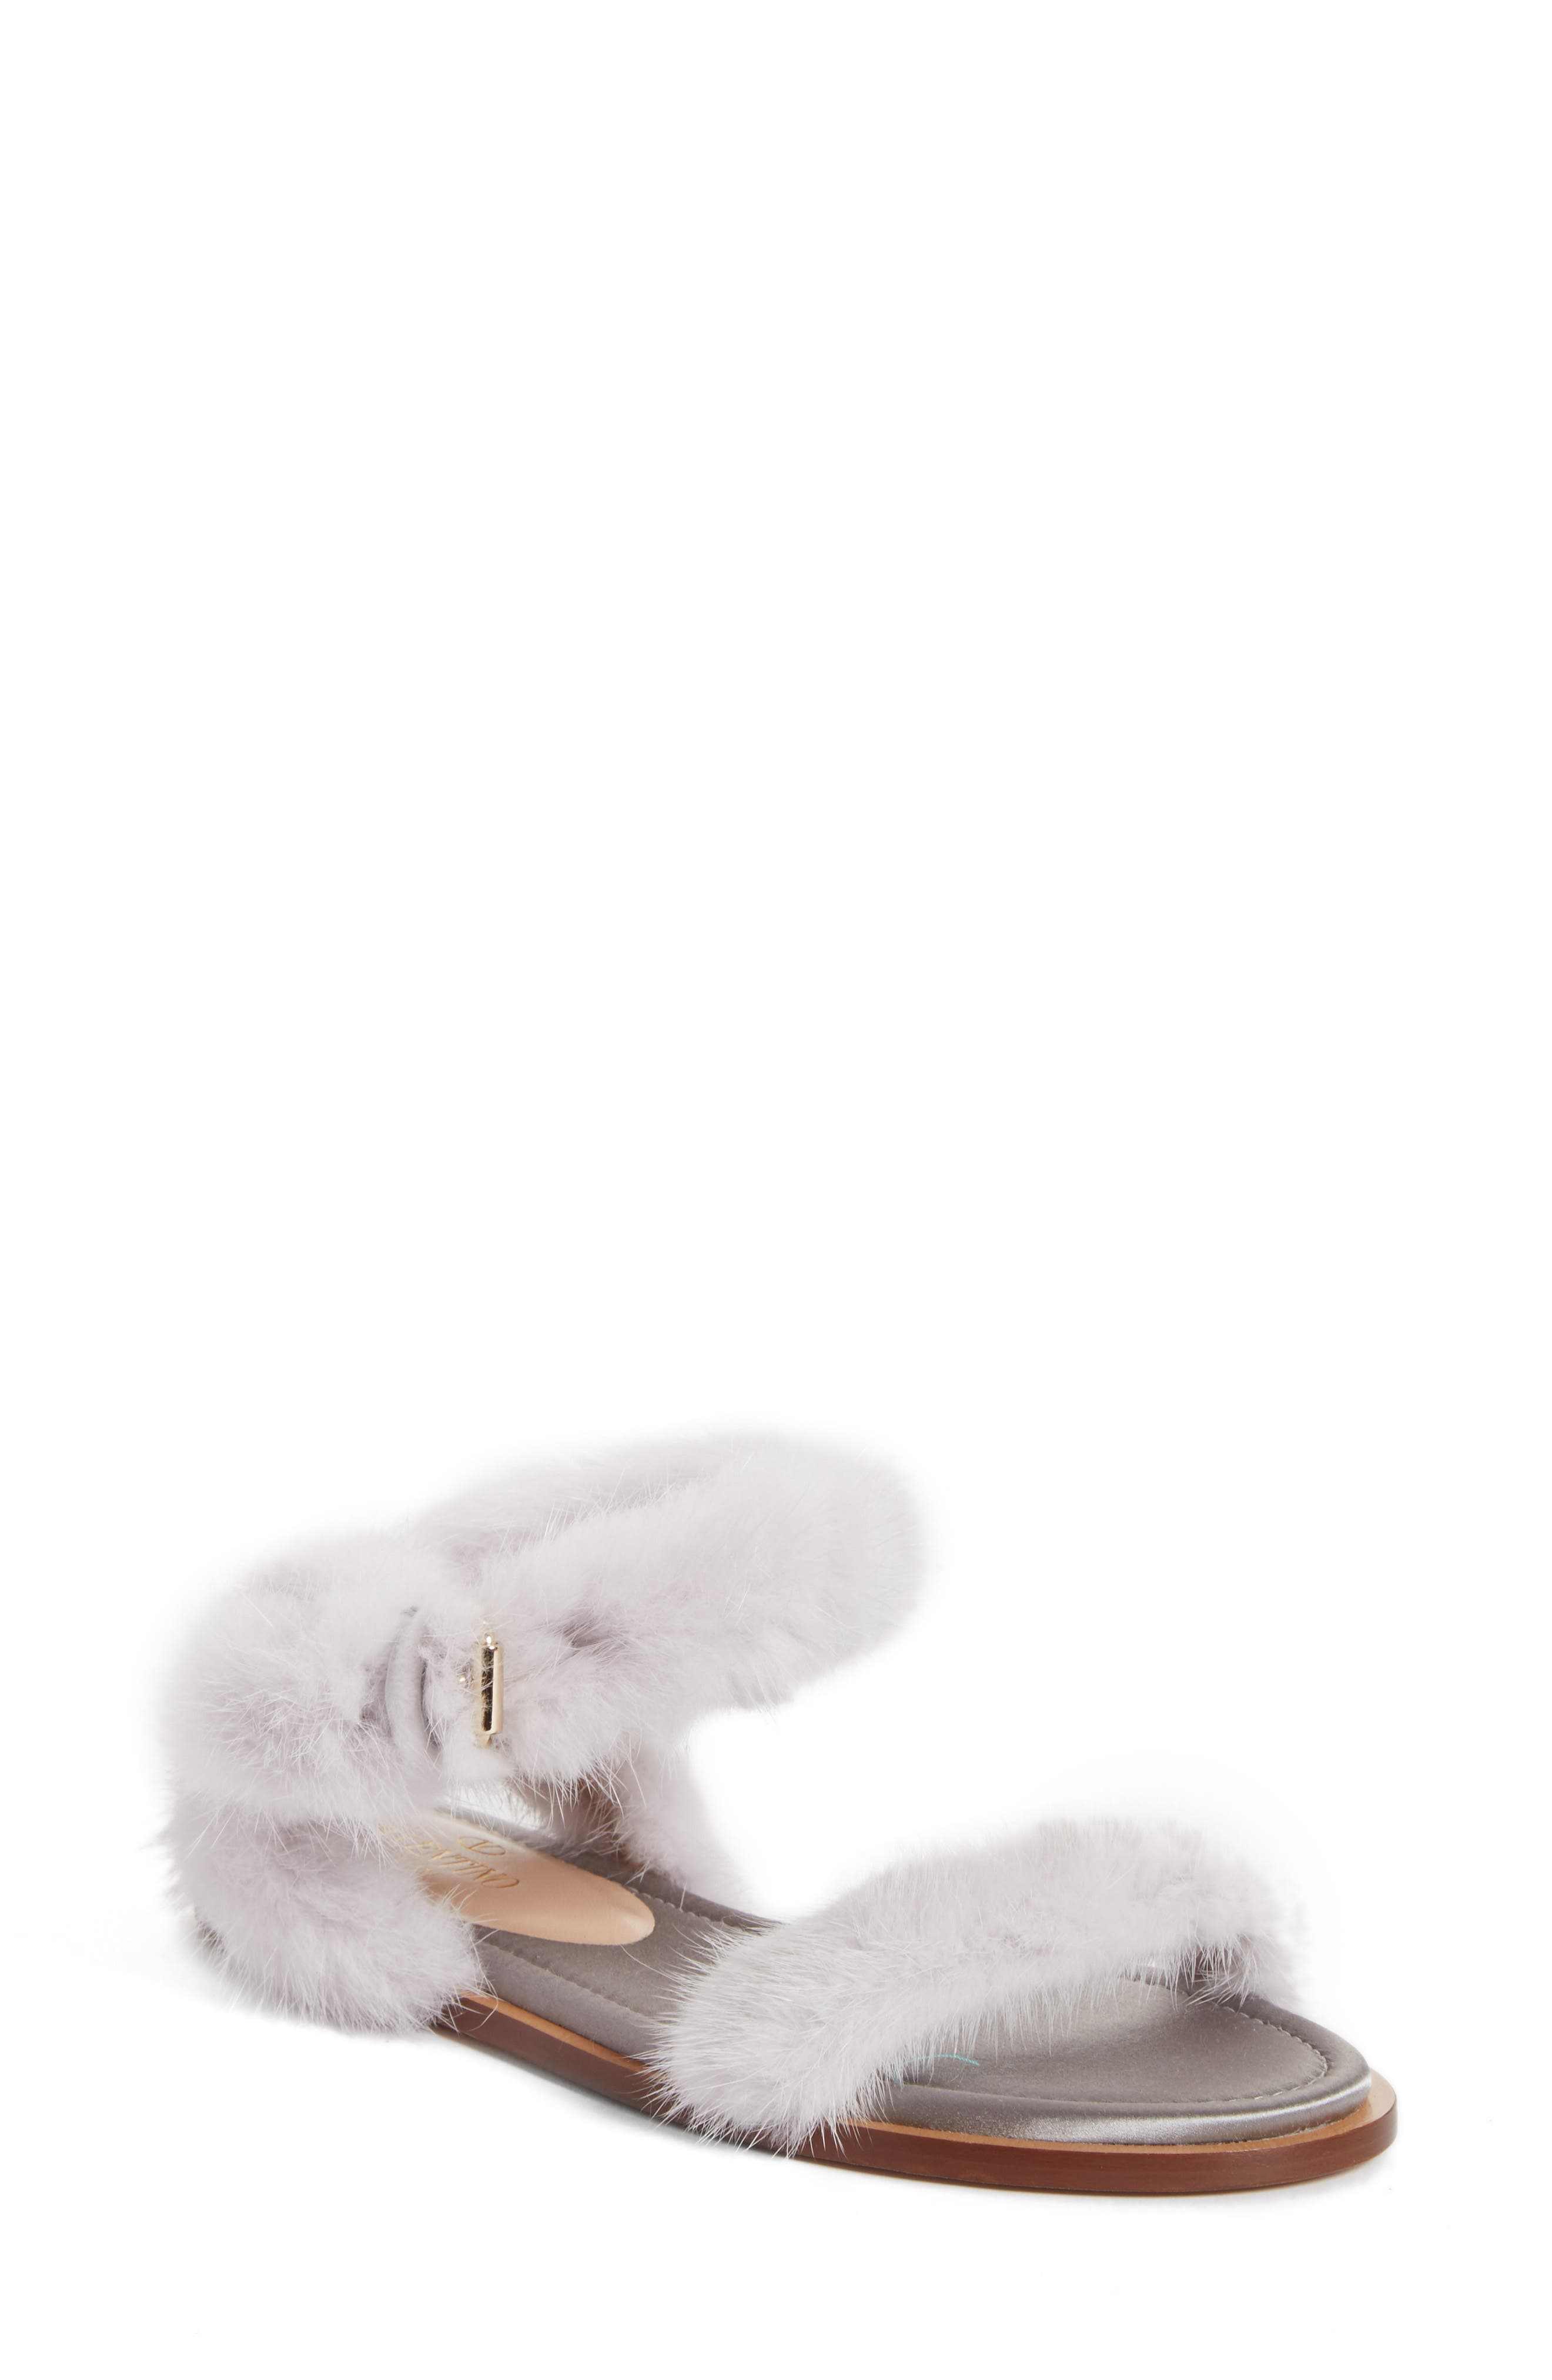 Genuine Mink Fur Sandal,                             Main thumbnail 1, color,                             030